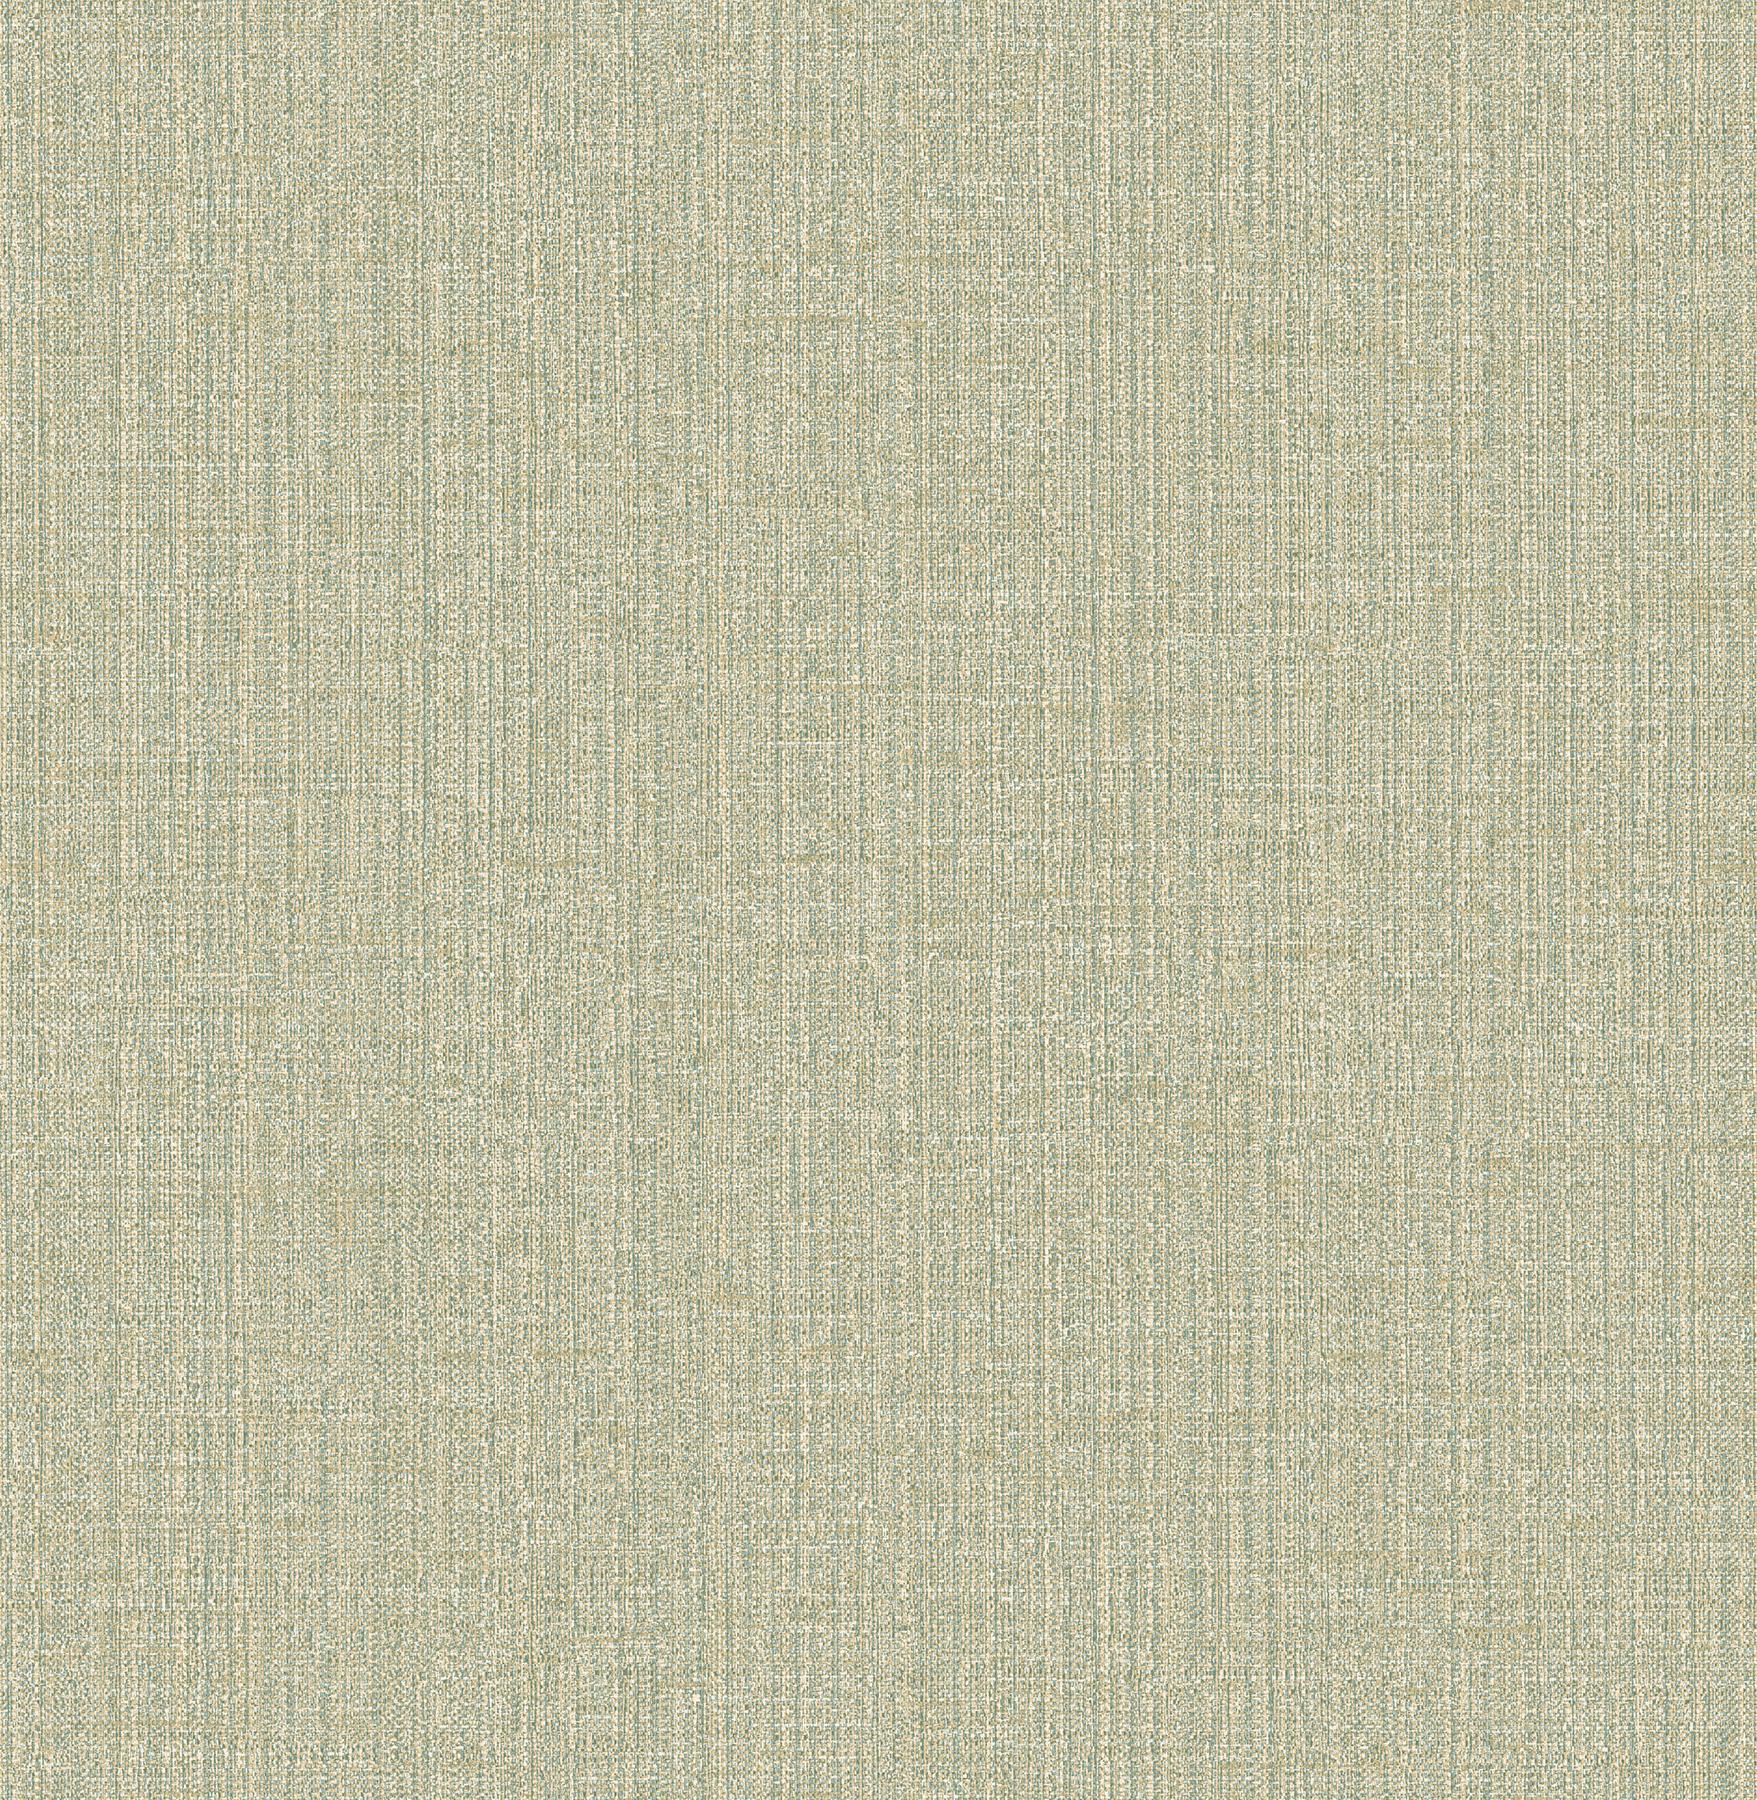 Picture of Beiene Light Green Weave Wallpaper